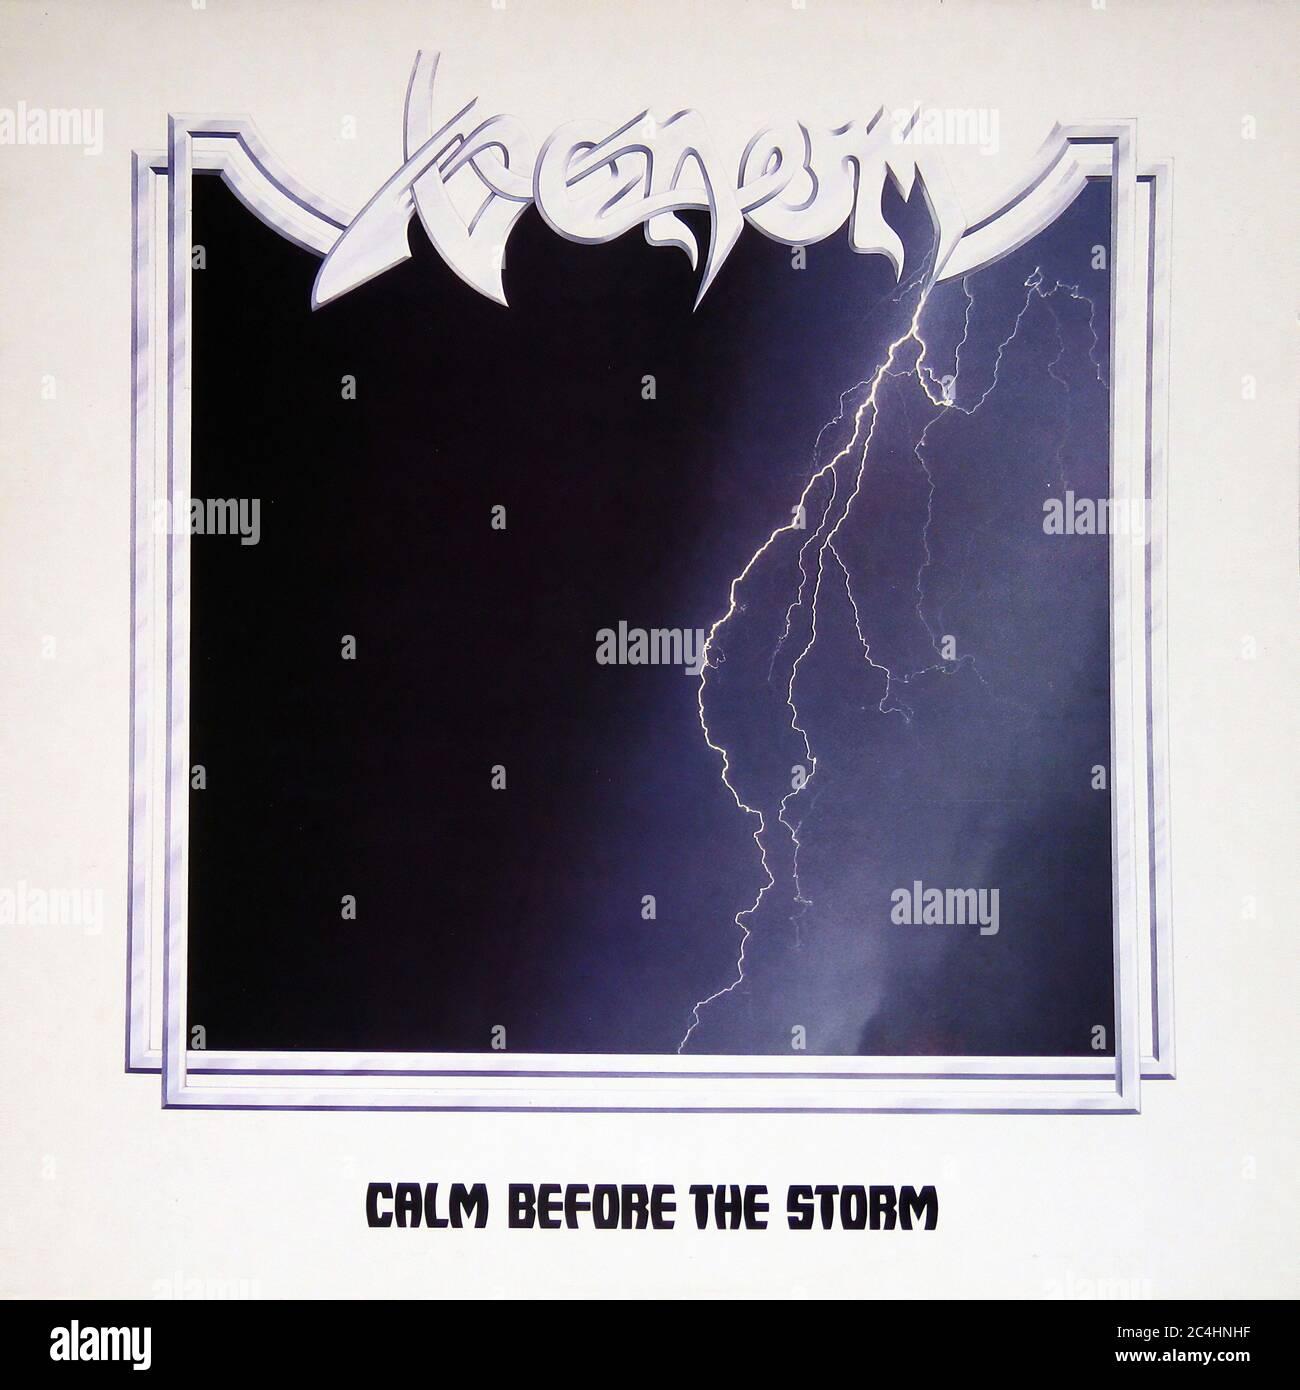 Venom Calm Before the Storm 12'' Vinyl Lp - Vintage Record Cover Stock Photo